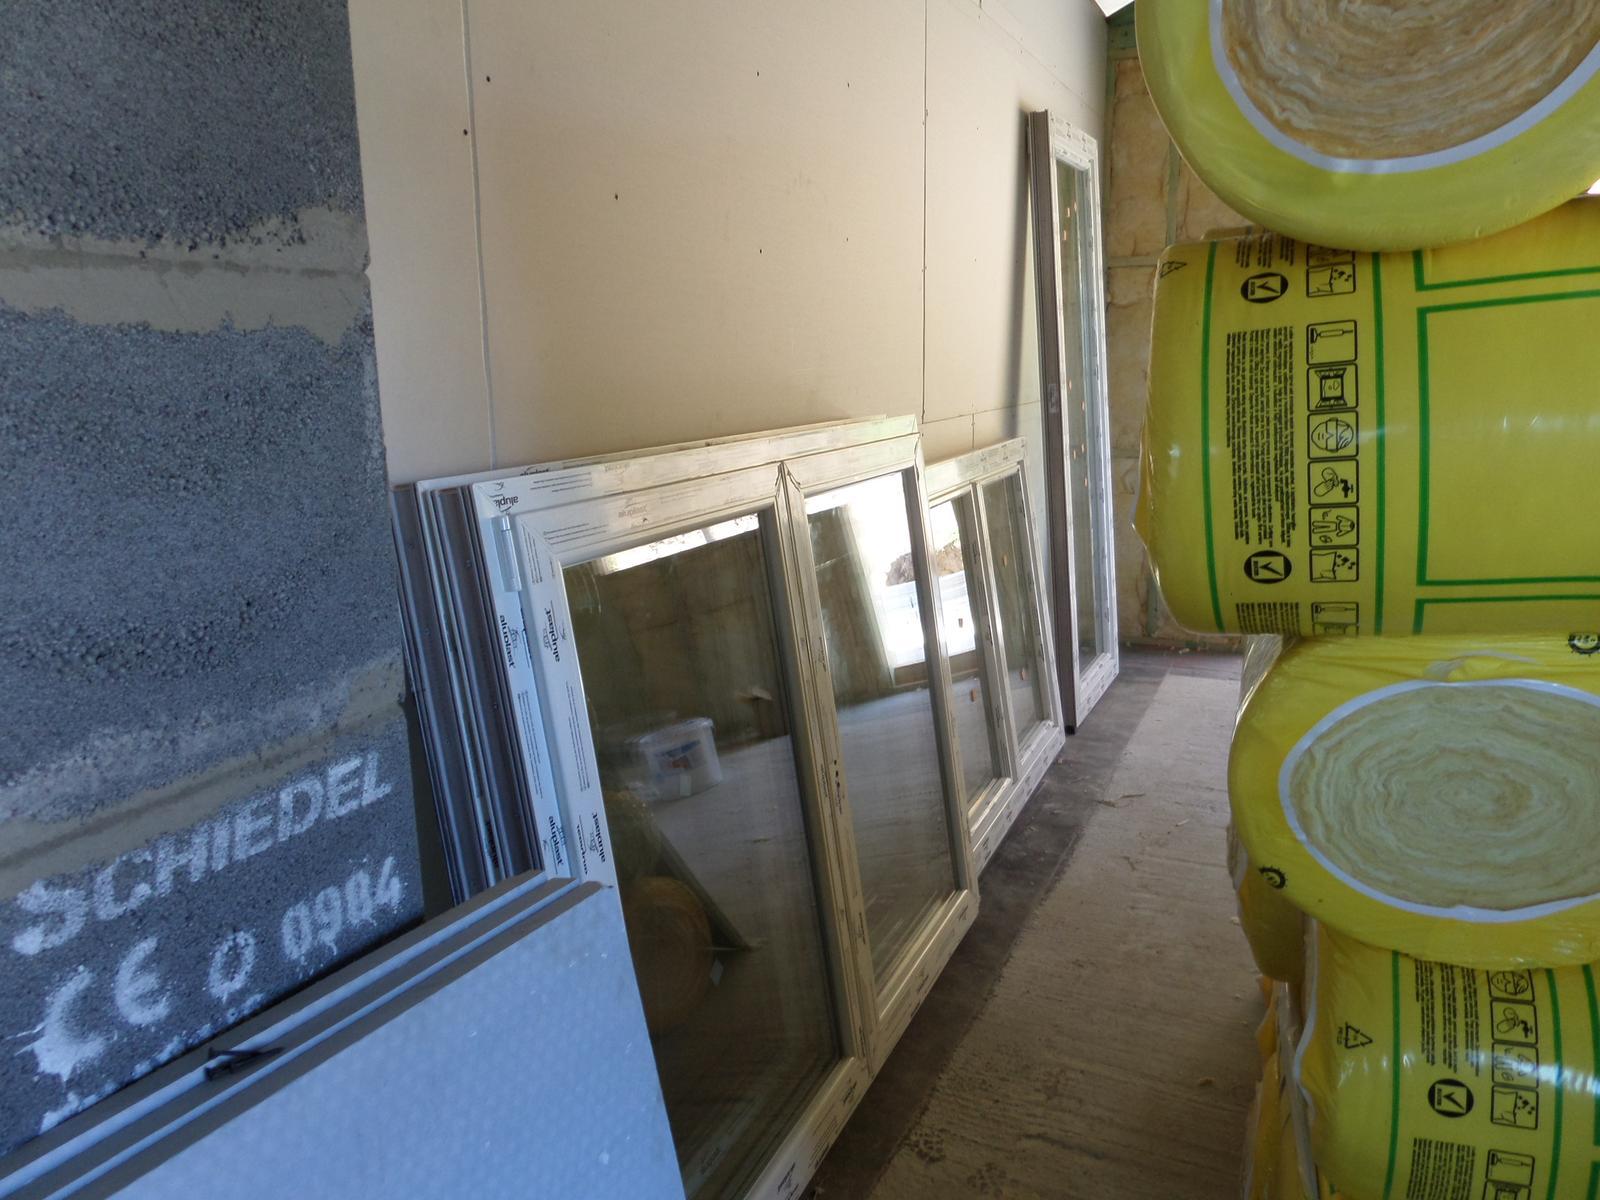 Bungalov Martina - 10.6.2014 privezené okná a vchodové dvere